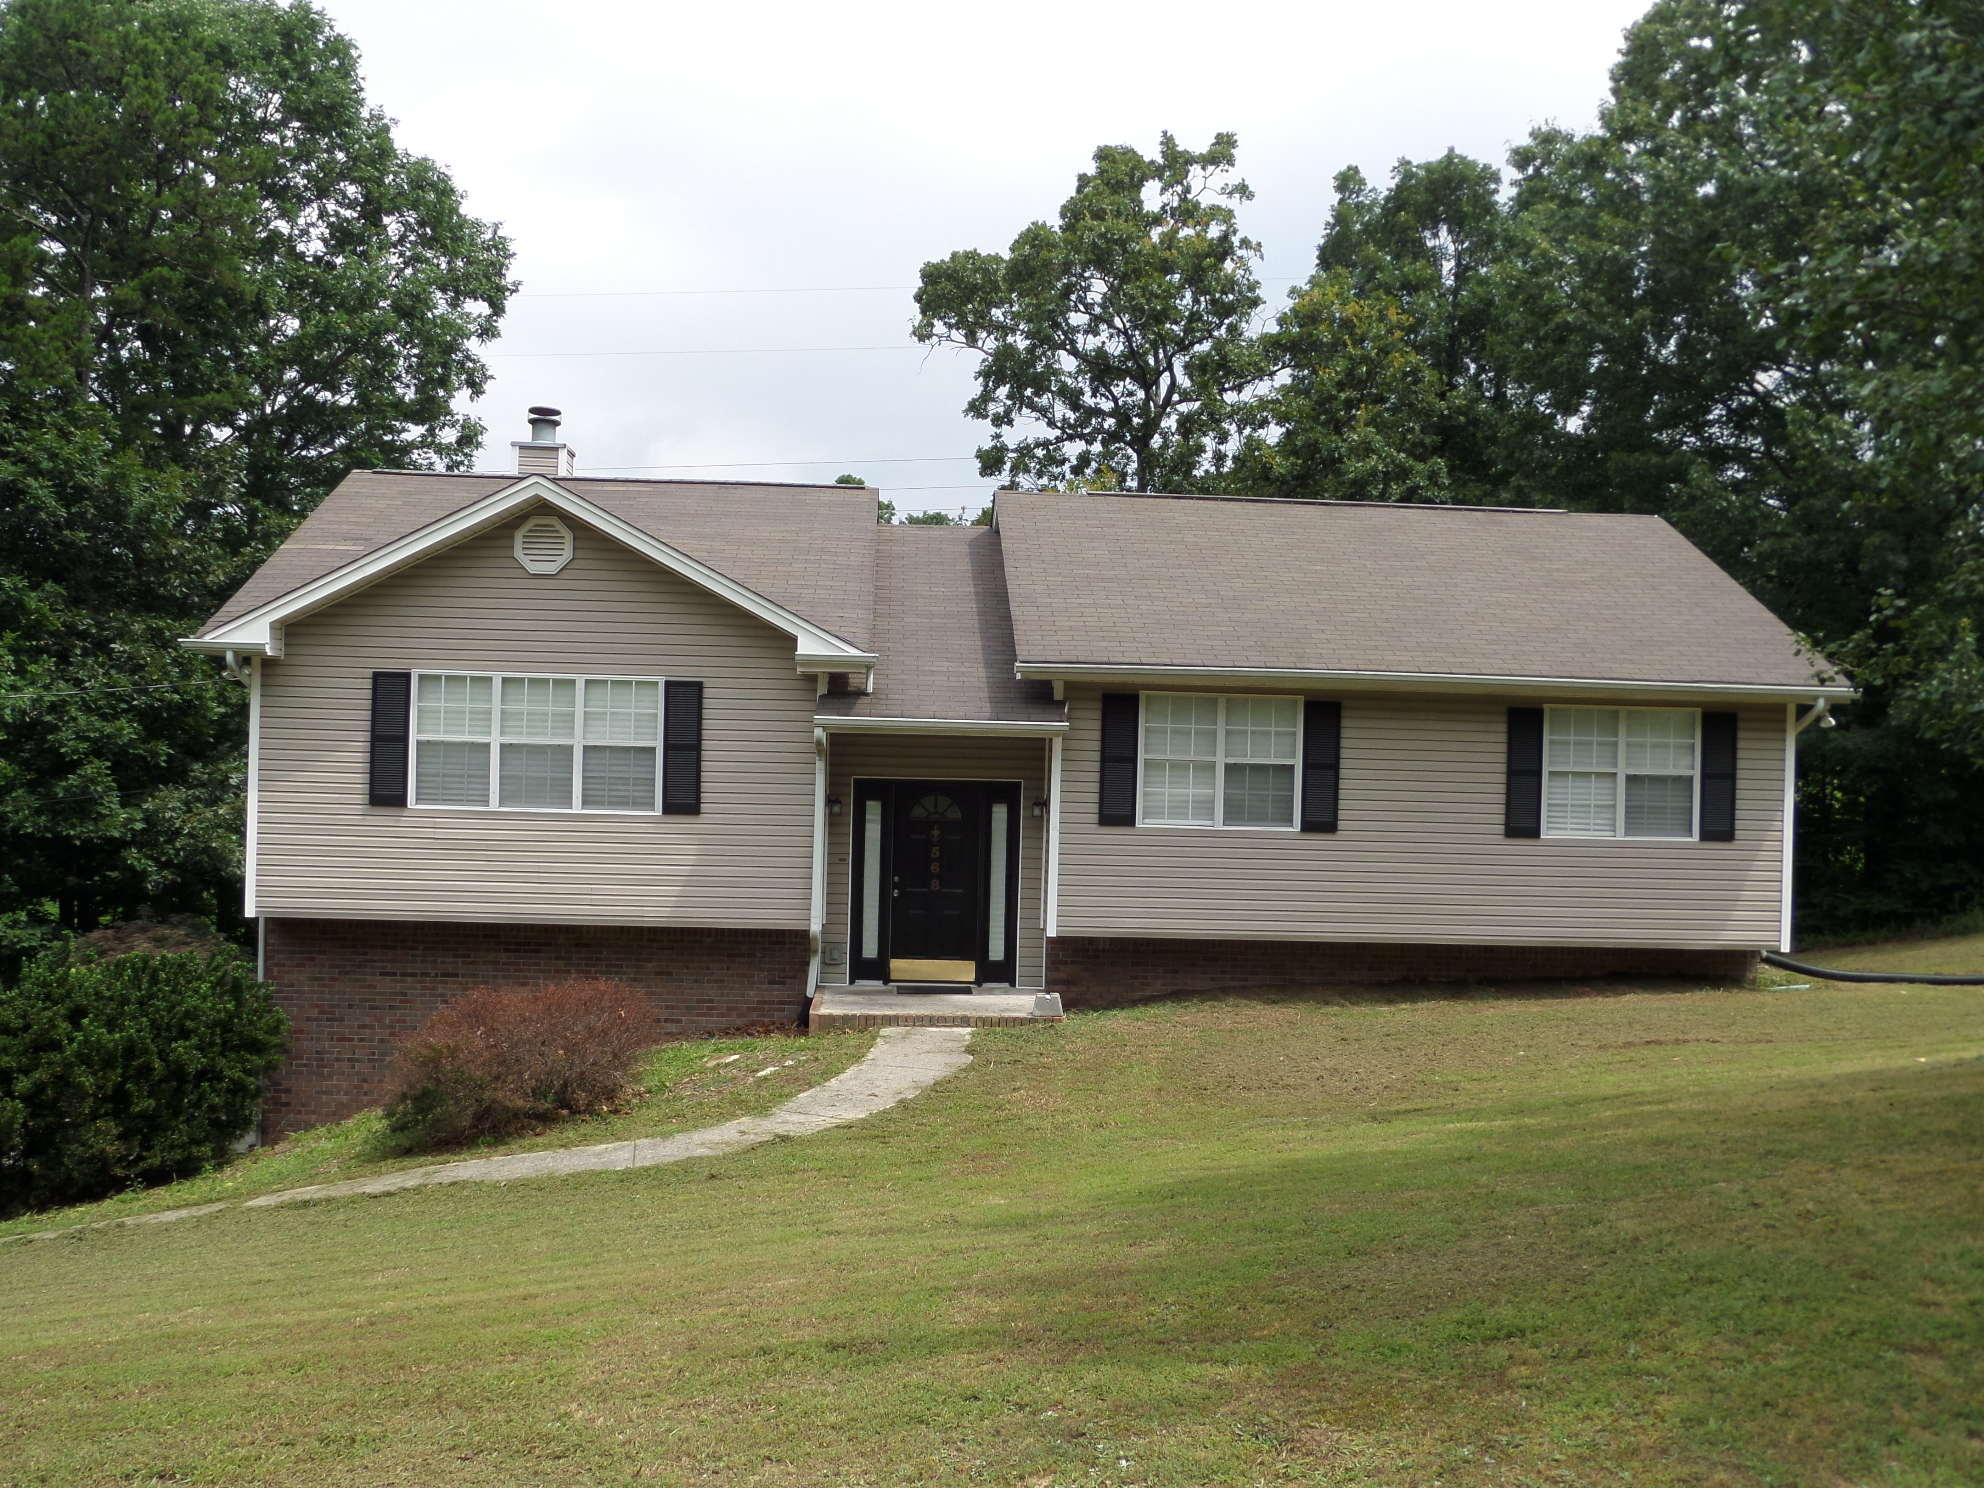 568 Castleview Dr, Ringgold, GA 30736